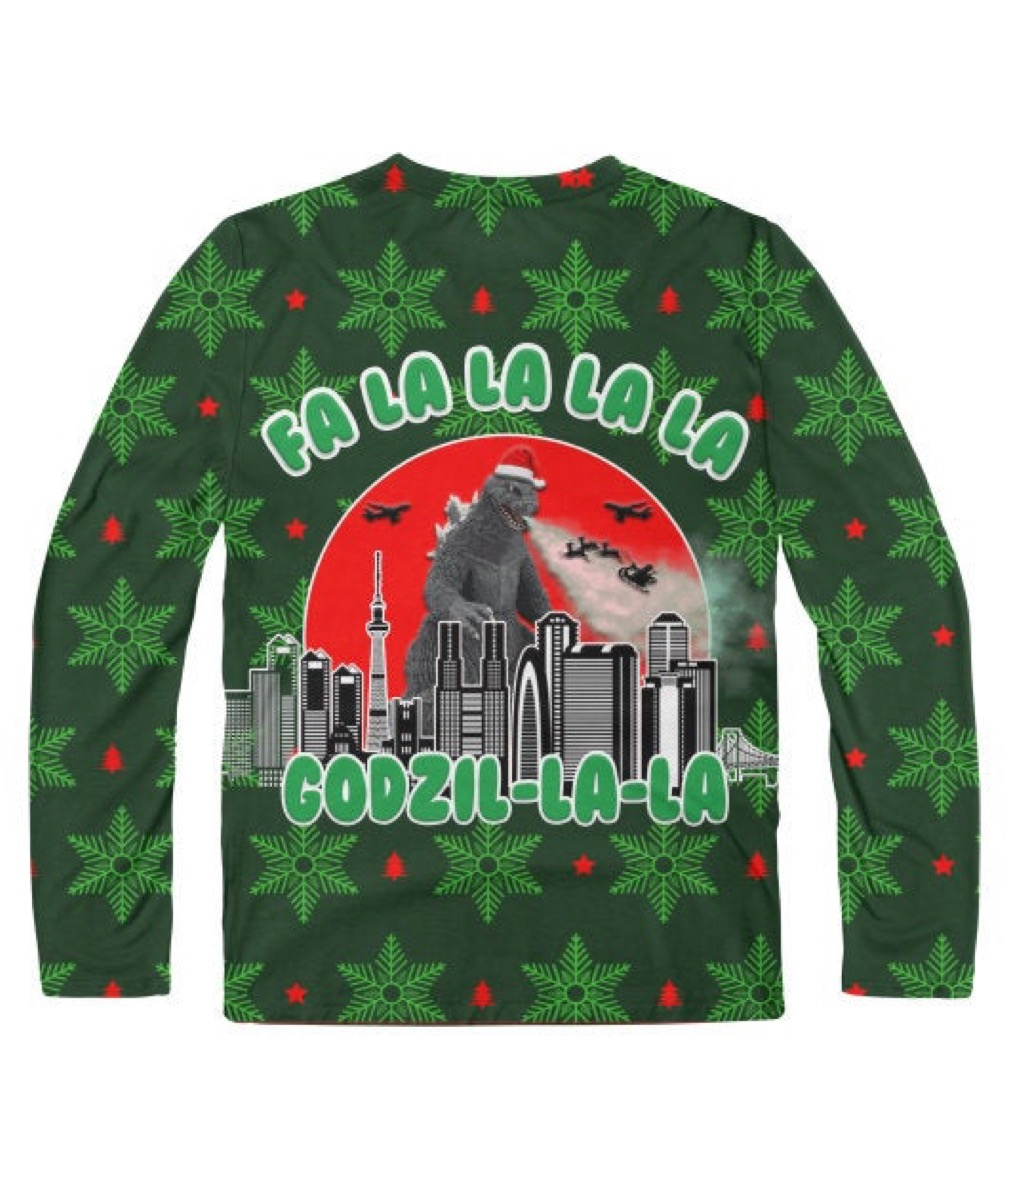 "green sweater with ""fa la la la la godzil-la-la"" on it"